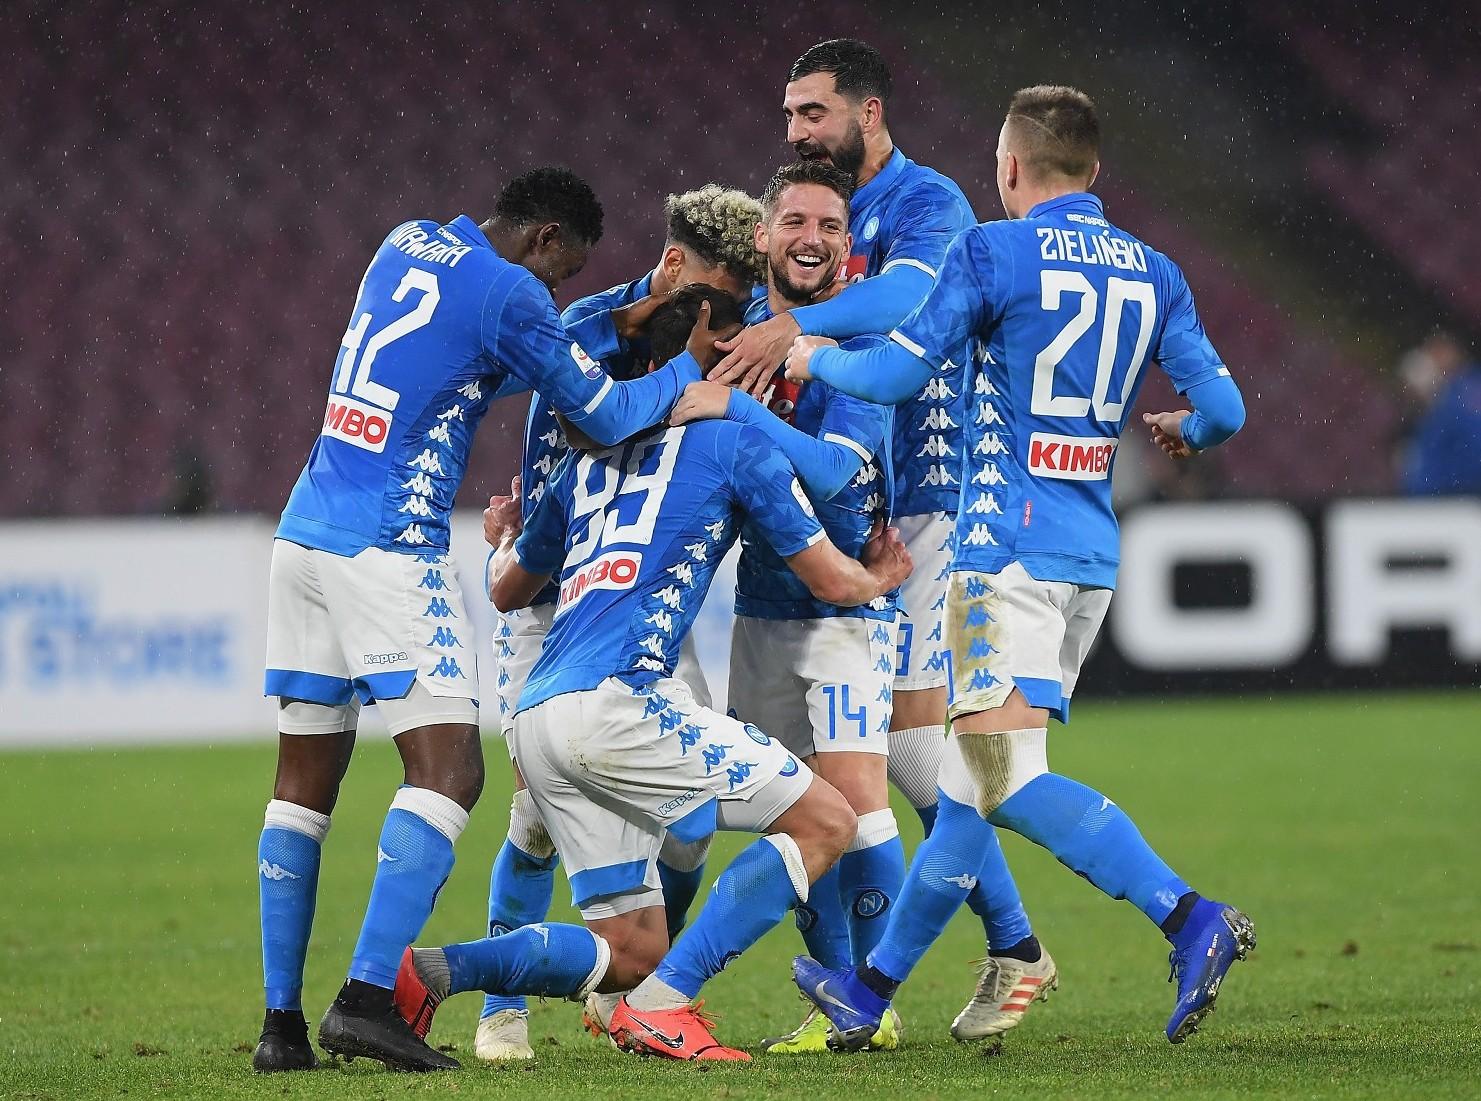 Napoli Arsenal Tv8, Sky o tv straniere o